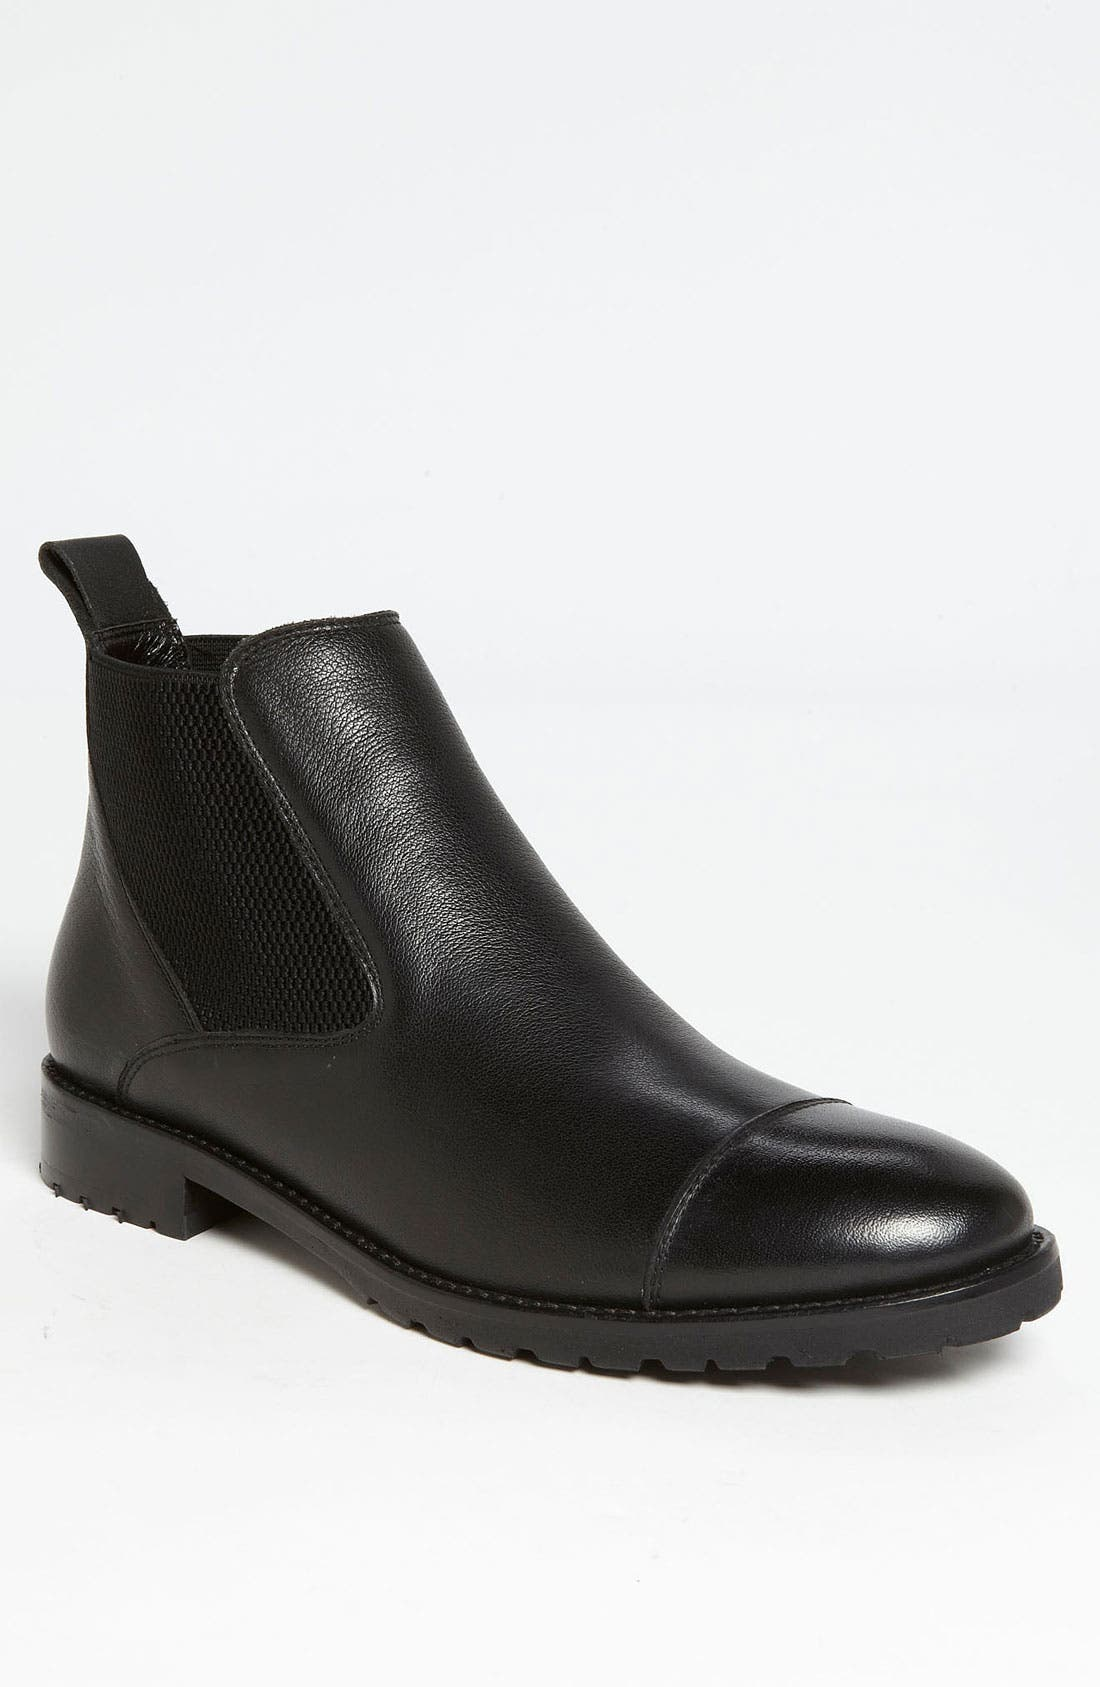 Main Image - Maison Forte 'Carlos' Chelsea Boot